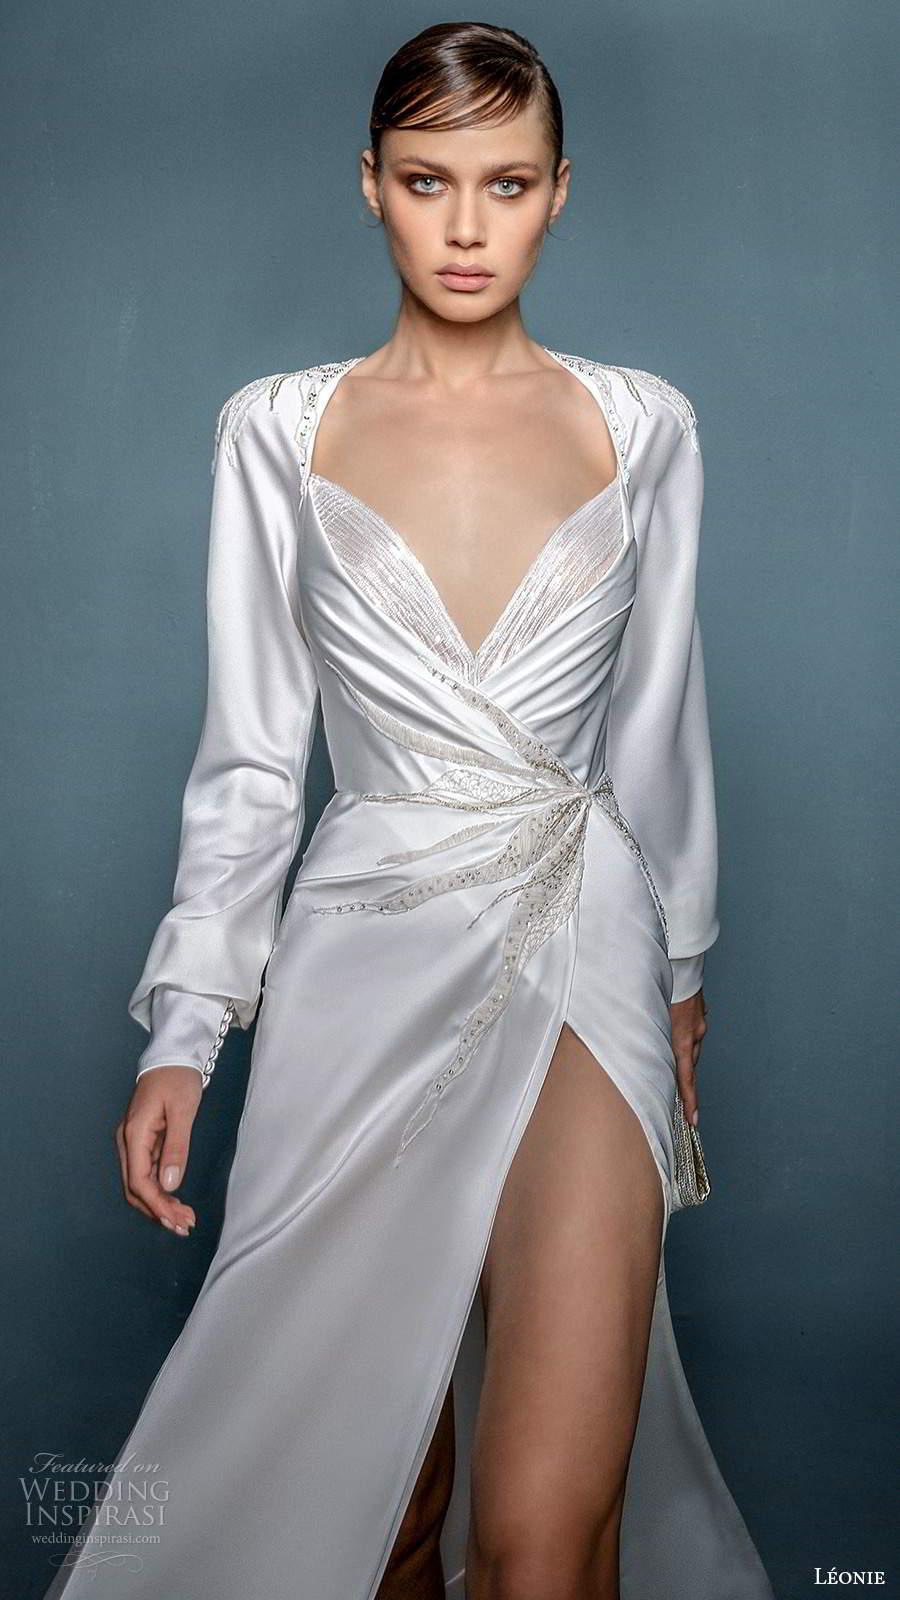 leonie bridal 2020 bridal long cuff sleeves queen anne neckline ruched bodice sheath wedding dress slit skirt (8) zv